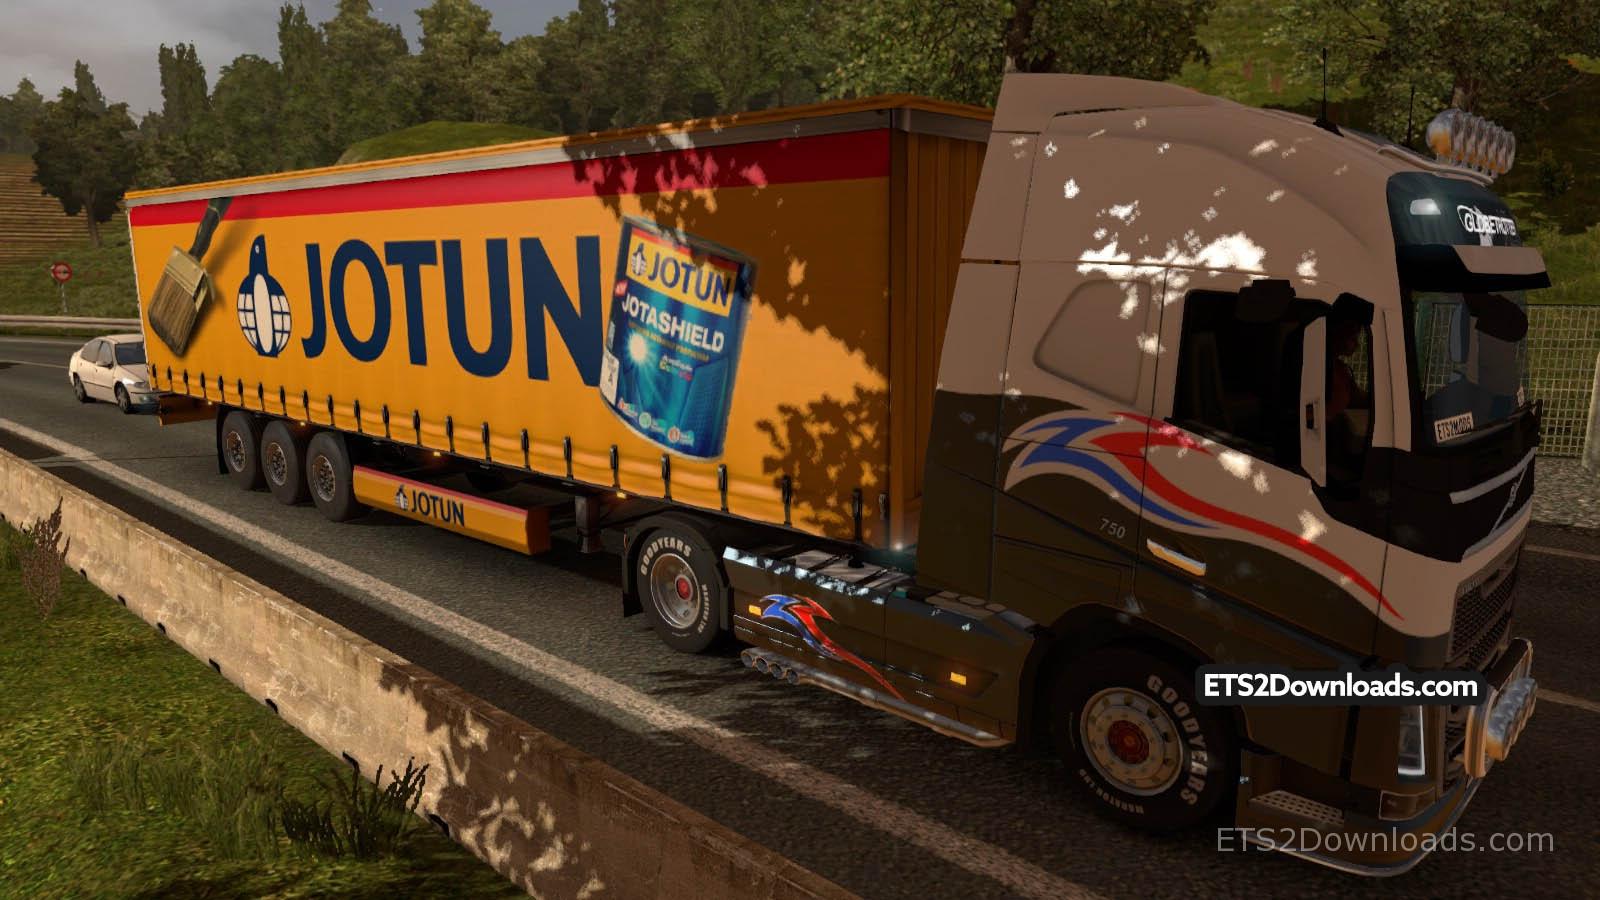 jotun-trailer-1